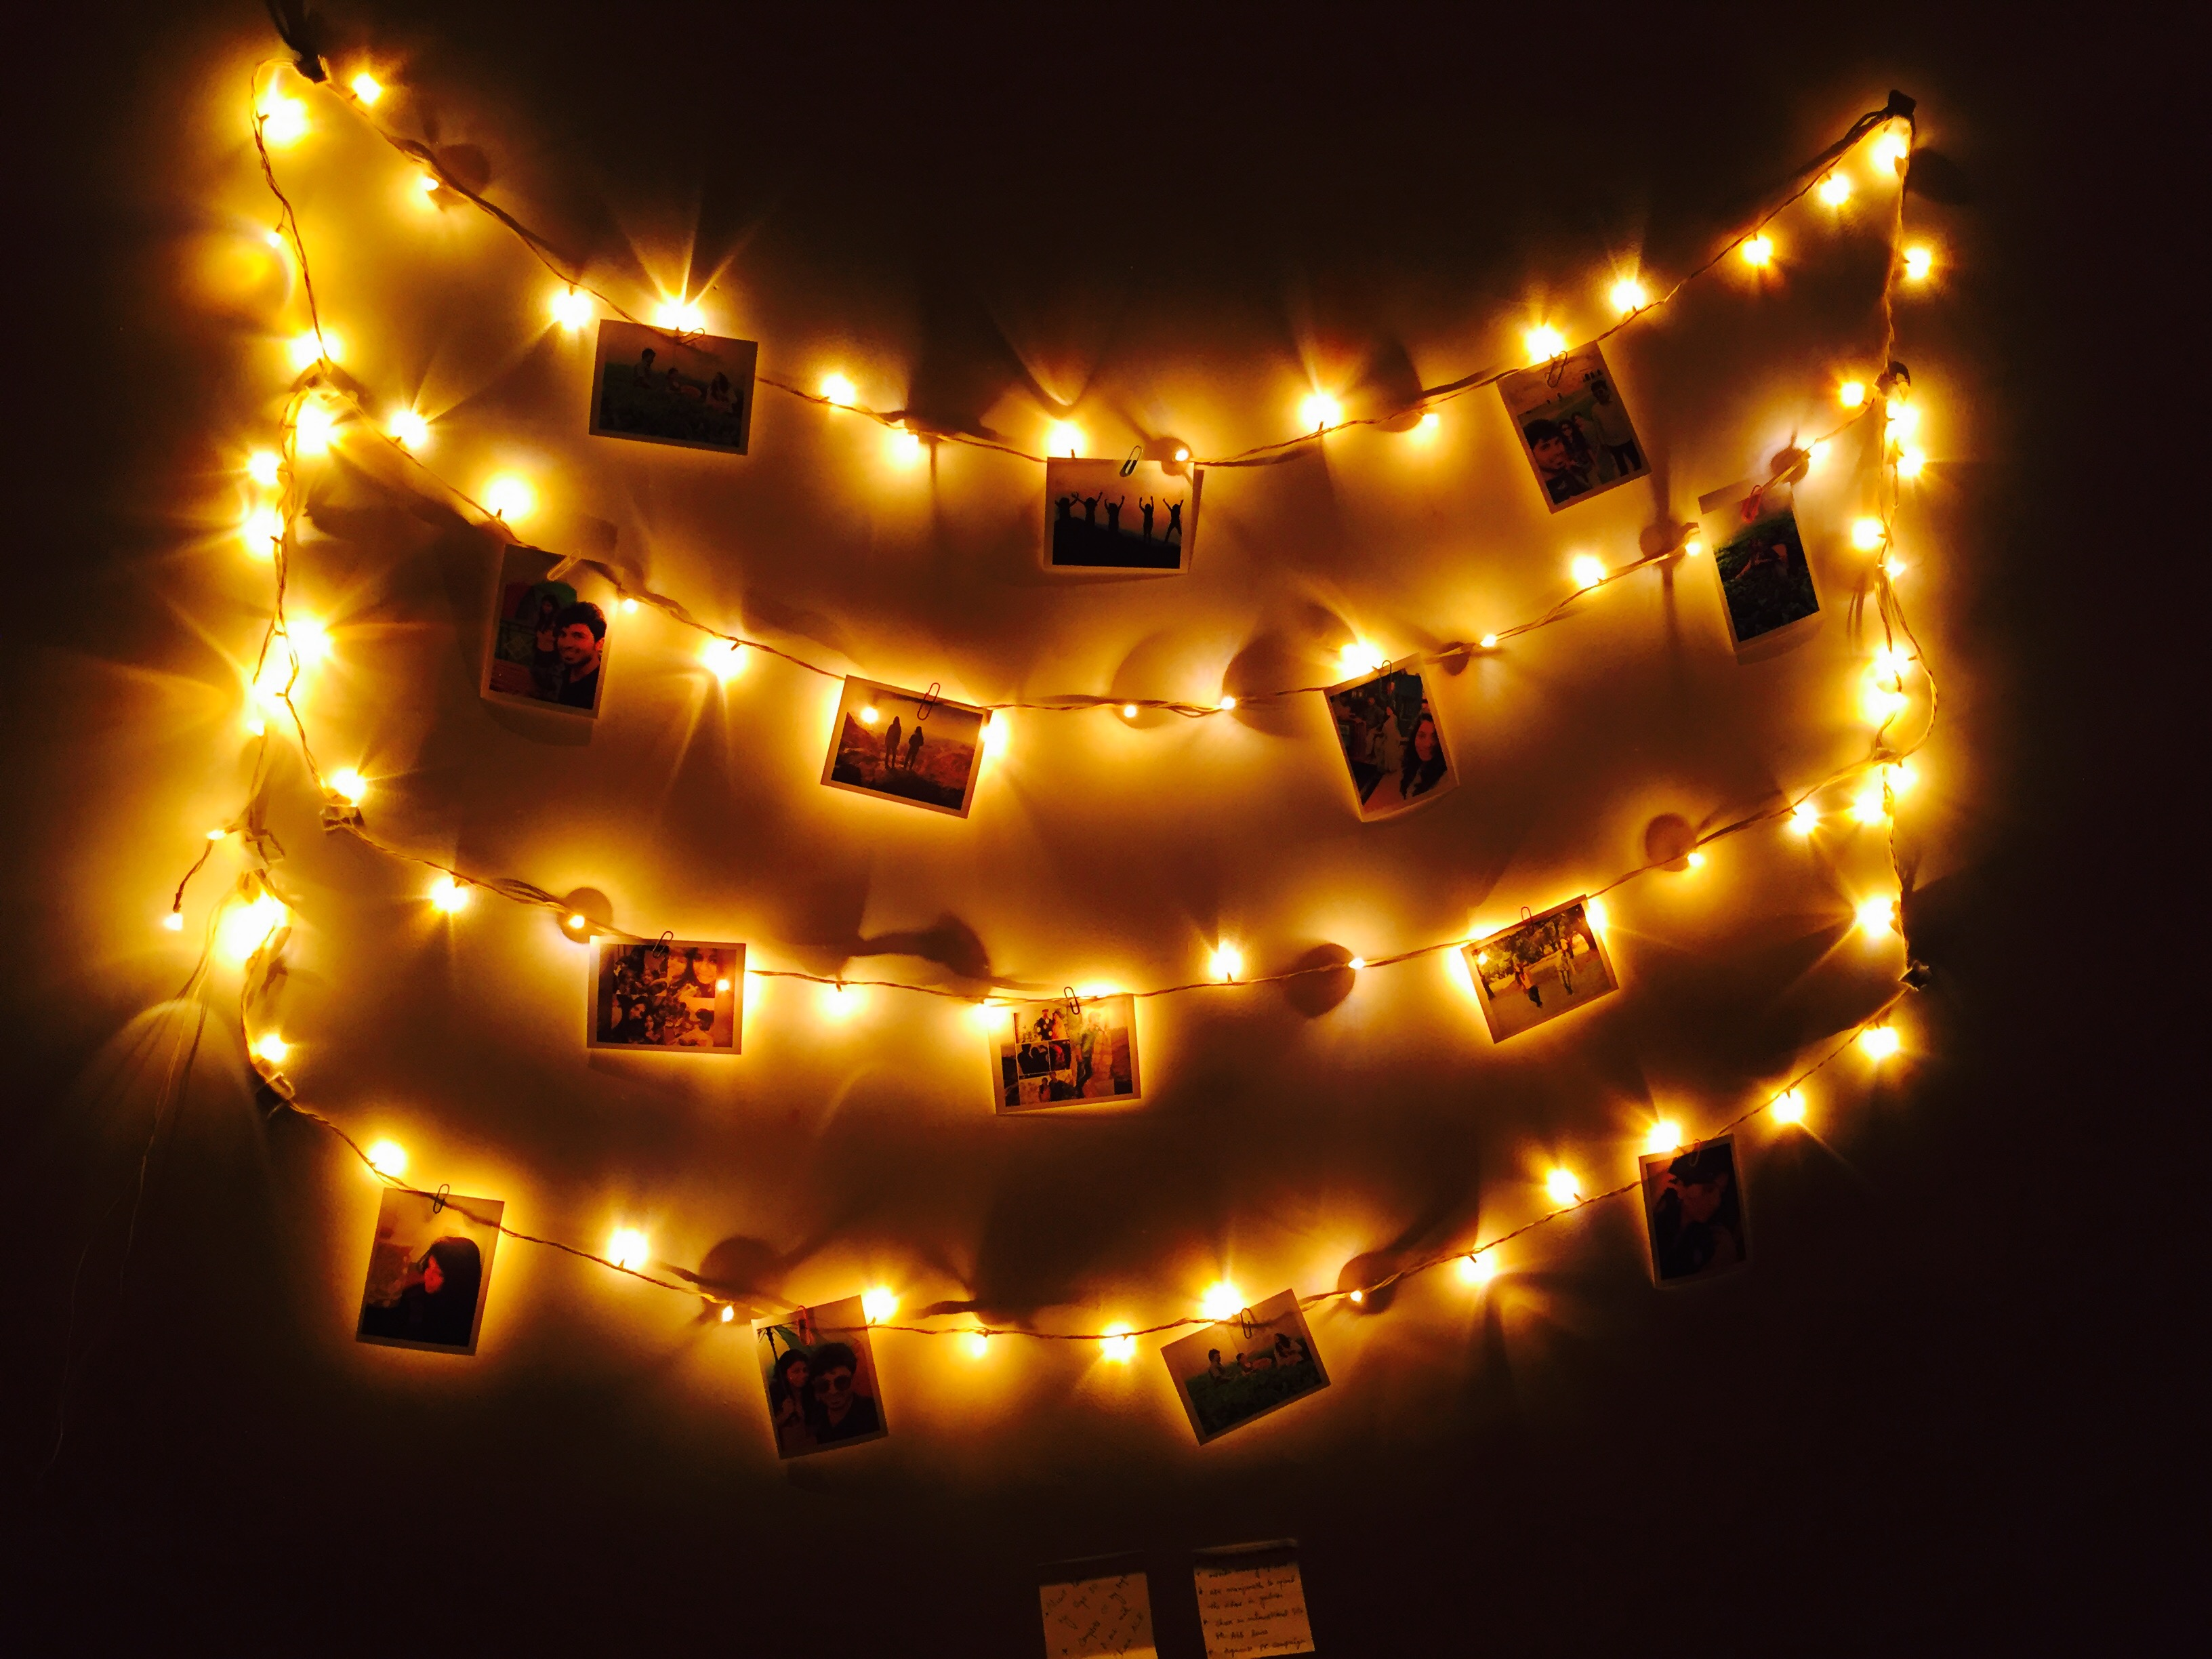 Cozy Fall Hd Wallpaper Lit Hanging Photo Frames 183 Free Stock Photo